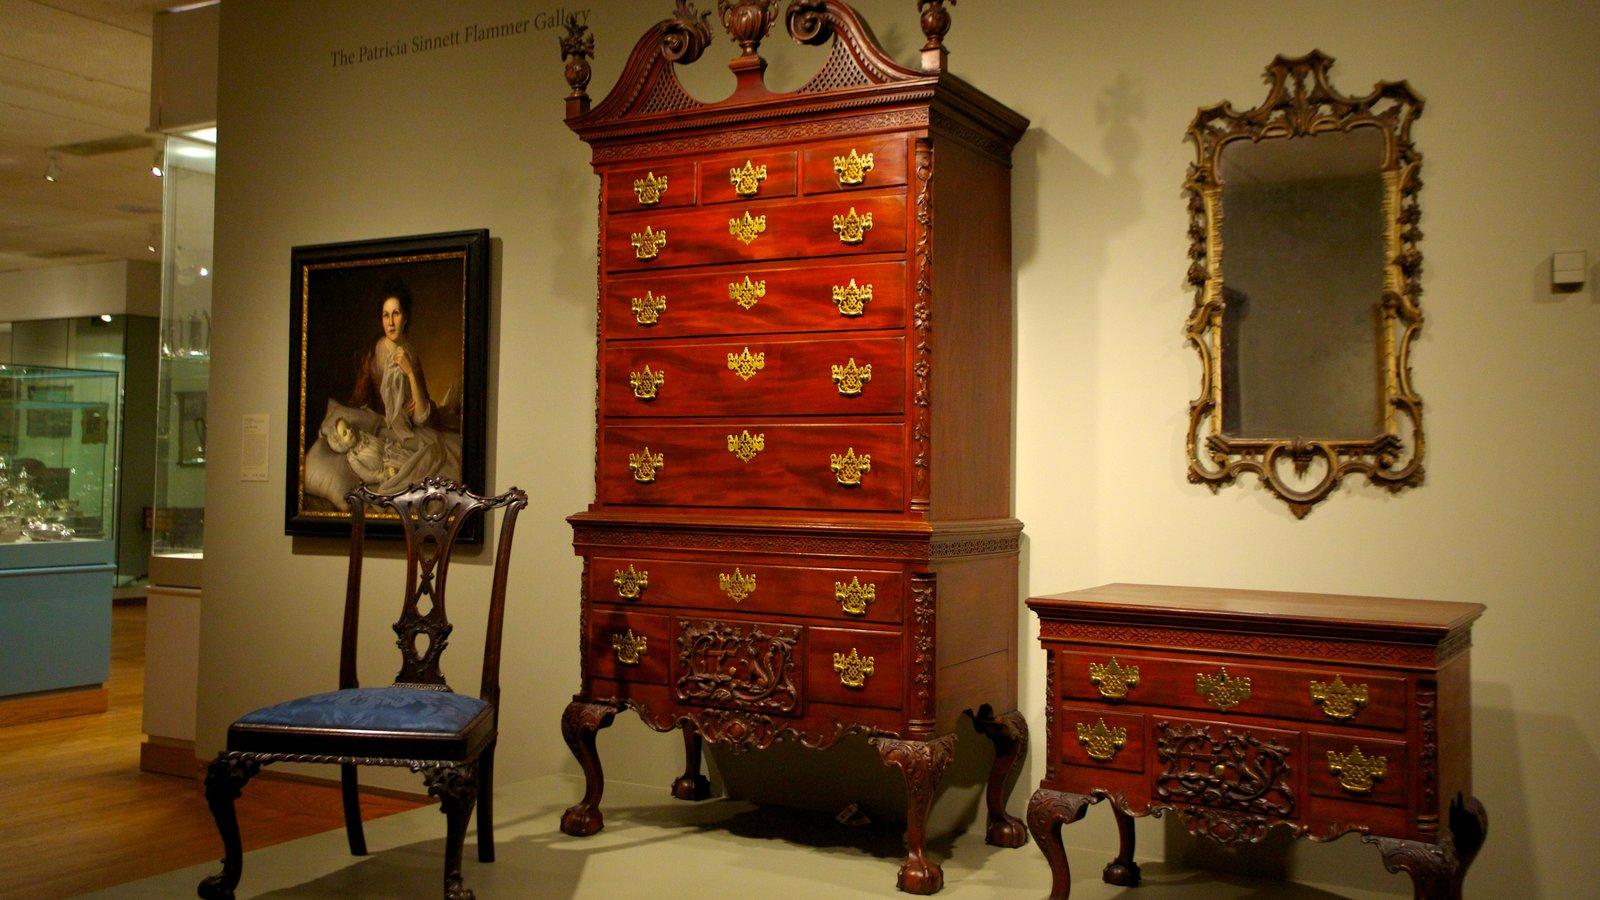 Museu de Arte caracterizando vistas internas e arte